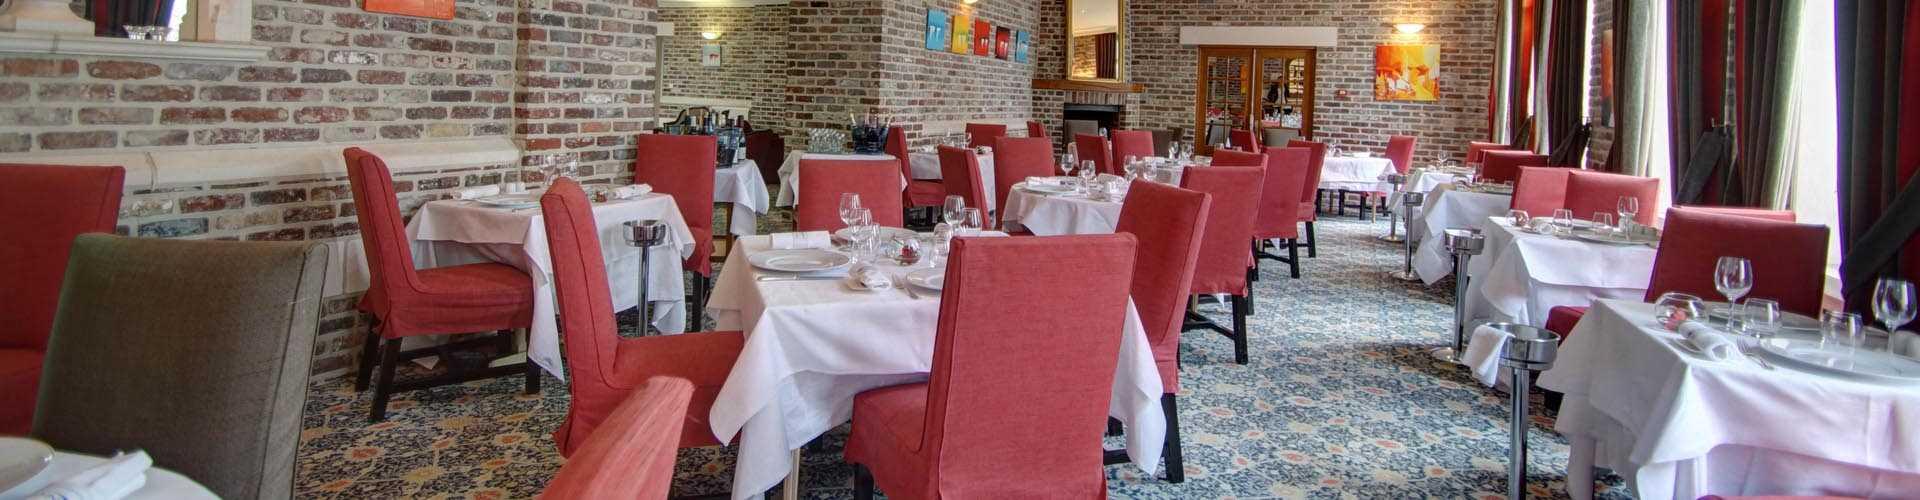 restaurant clusius boulogne